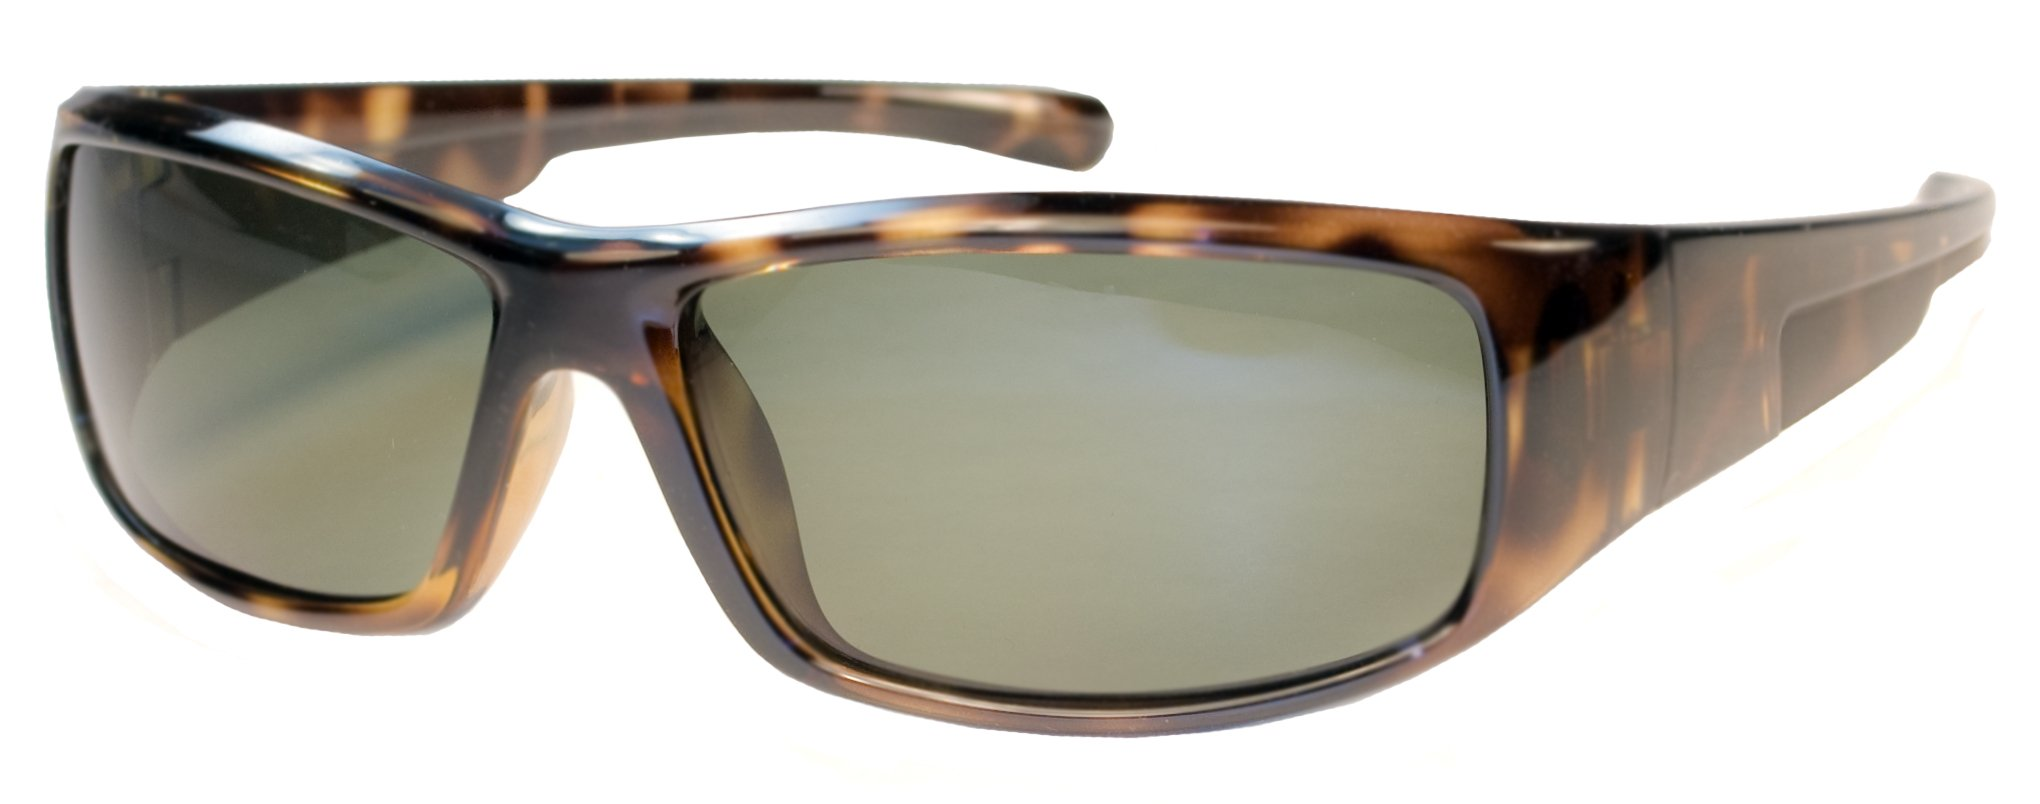 Kids Polarized Sunglasses for Age 6-12 JR65PL (Tortoise & Smoke)